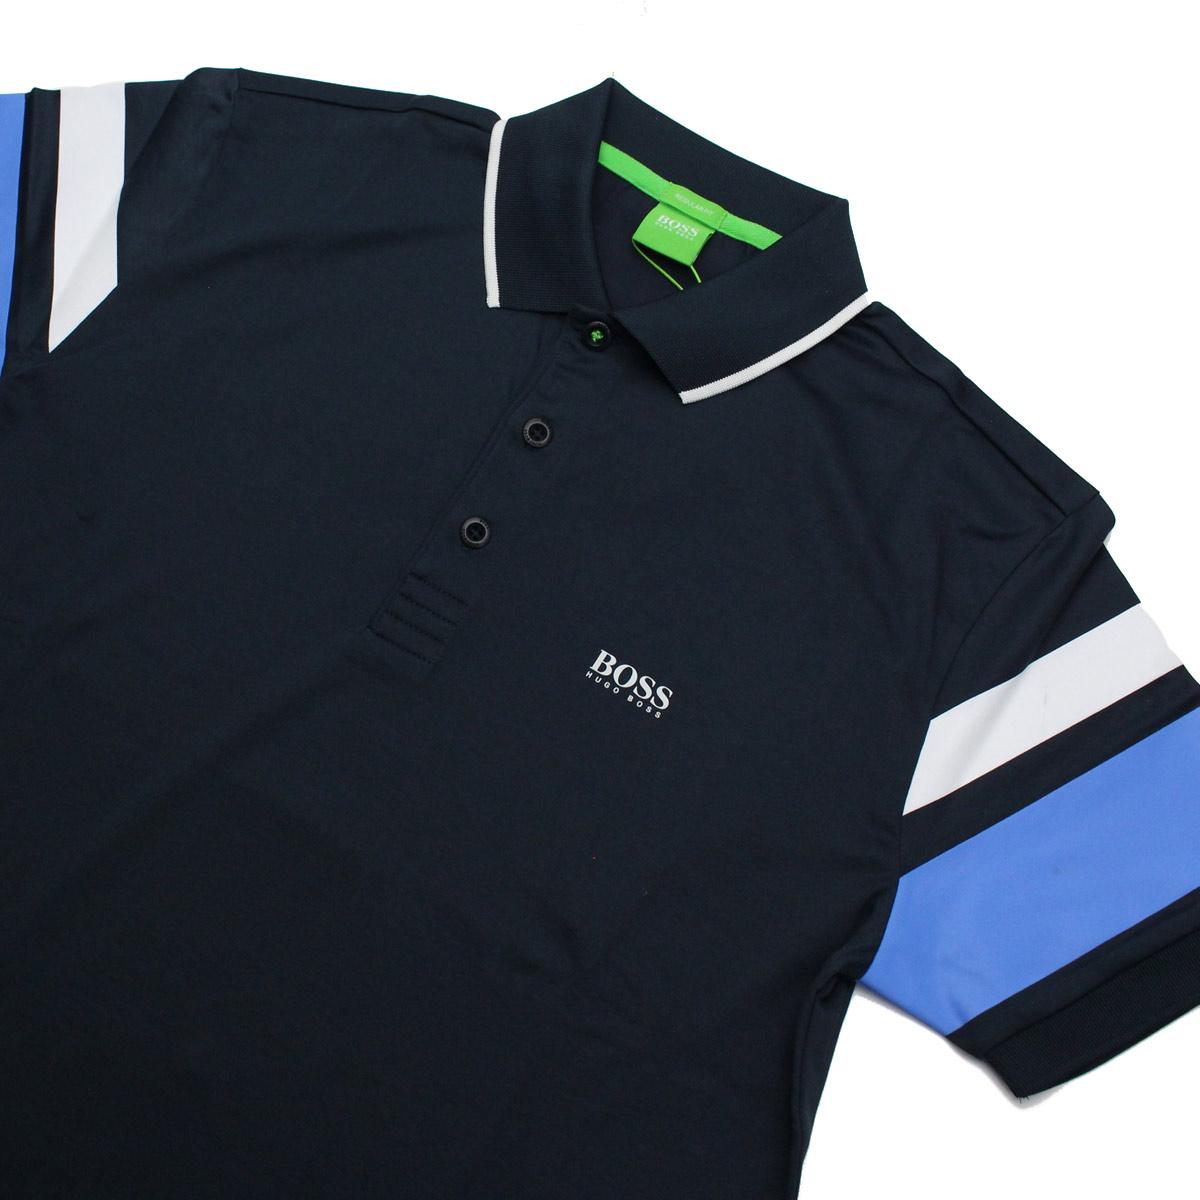 68e2a2860 Bighit The total brand wholesale: Hugo boss (HUGO BOSS) PADDY 5 ...